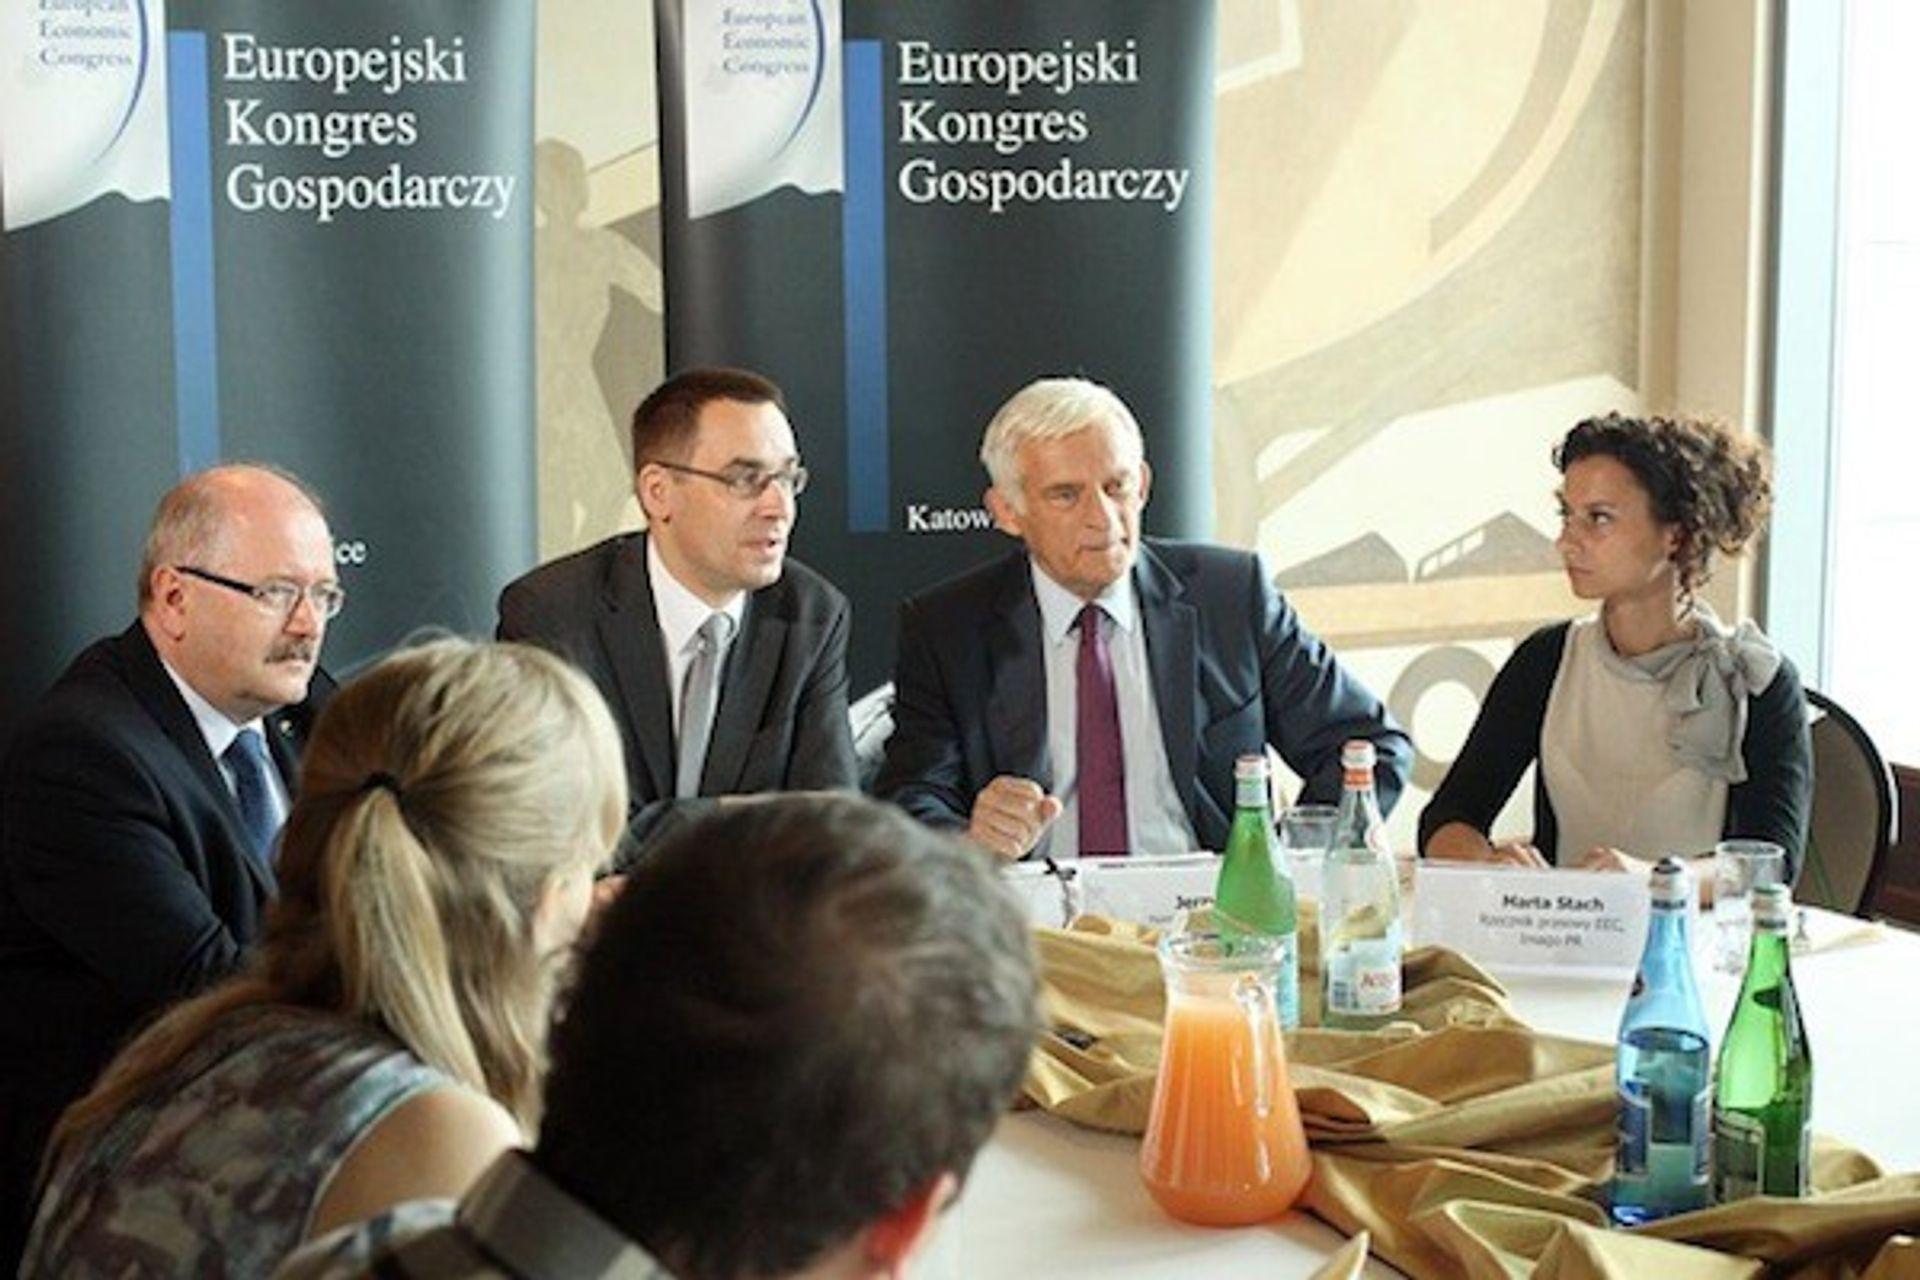 [Katowice] Europejski Kongres Gospodarczy 2013 - podsumowanie